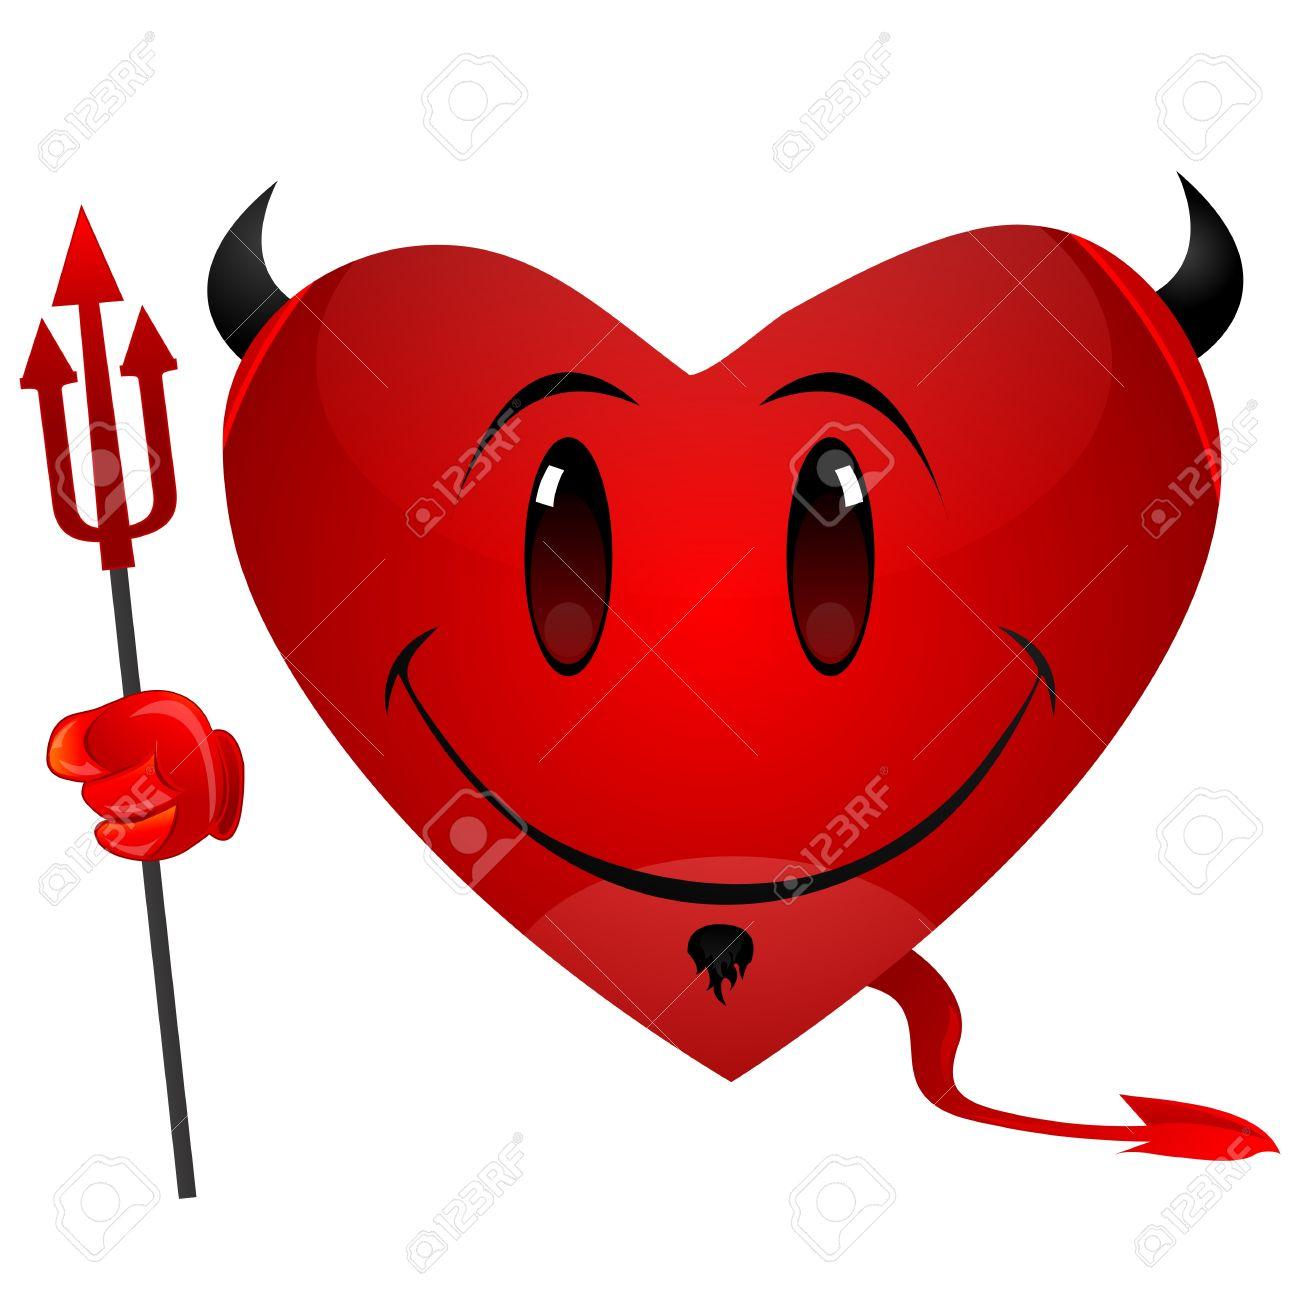 illustration of smiley devil heart royalty free cliparts vectors